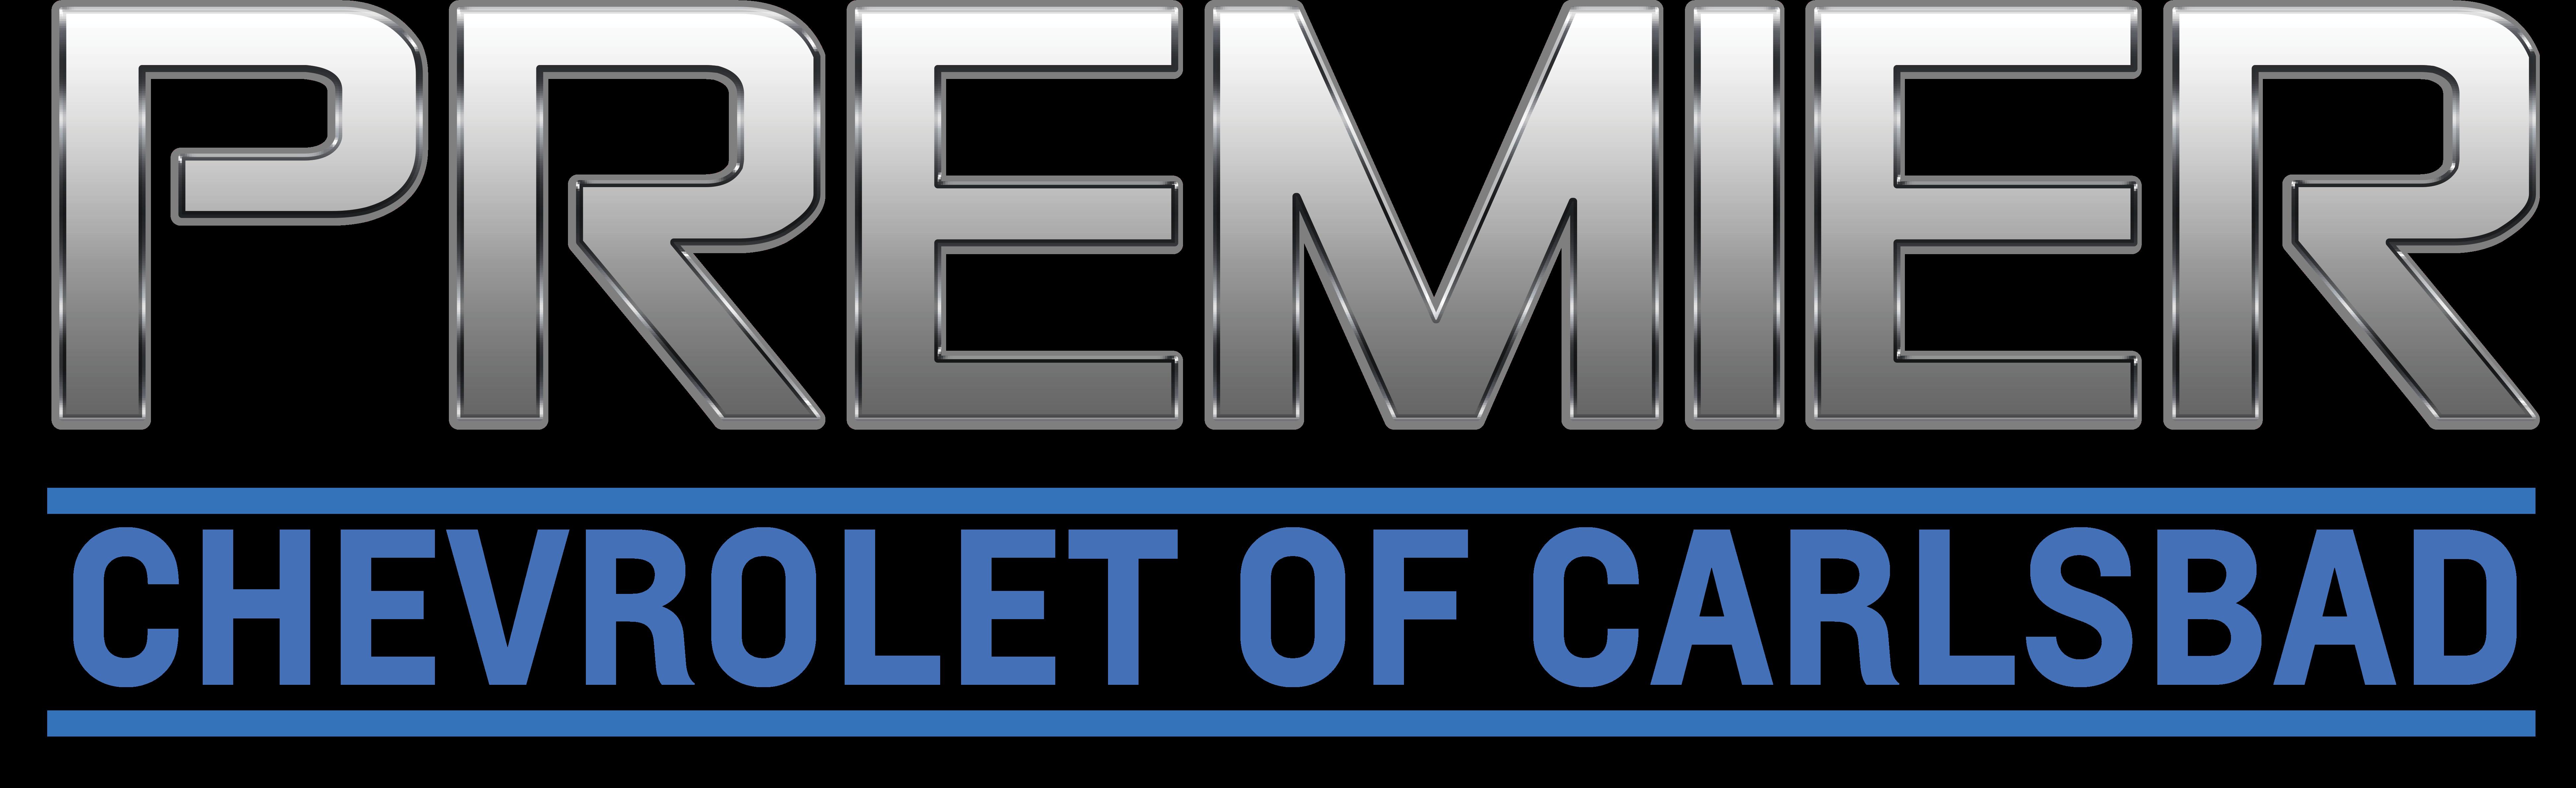 Premier Chevrolet of Carlsbad